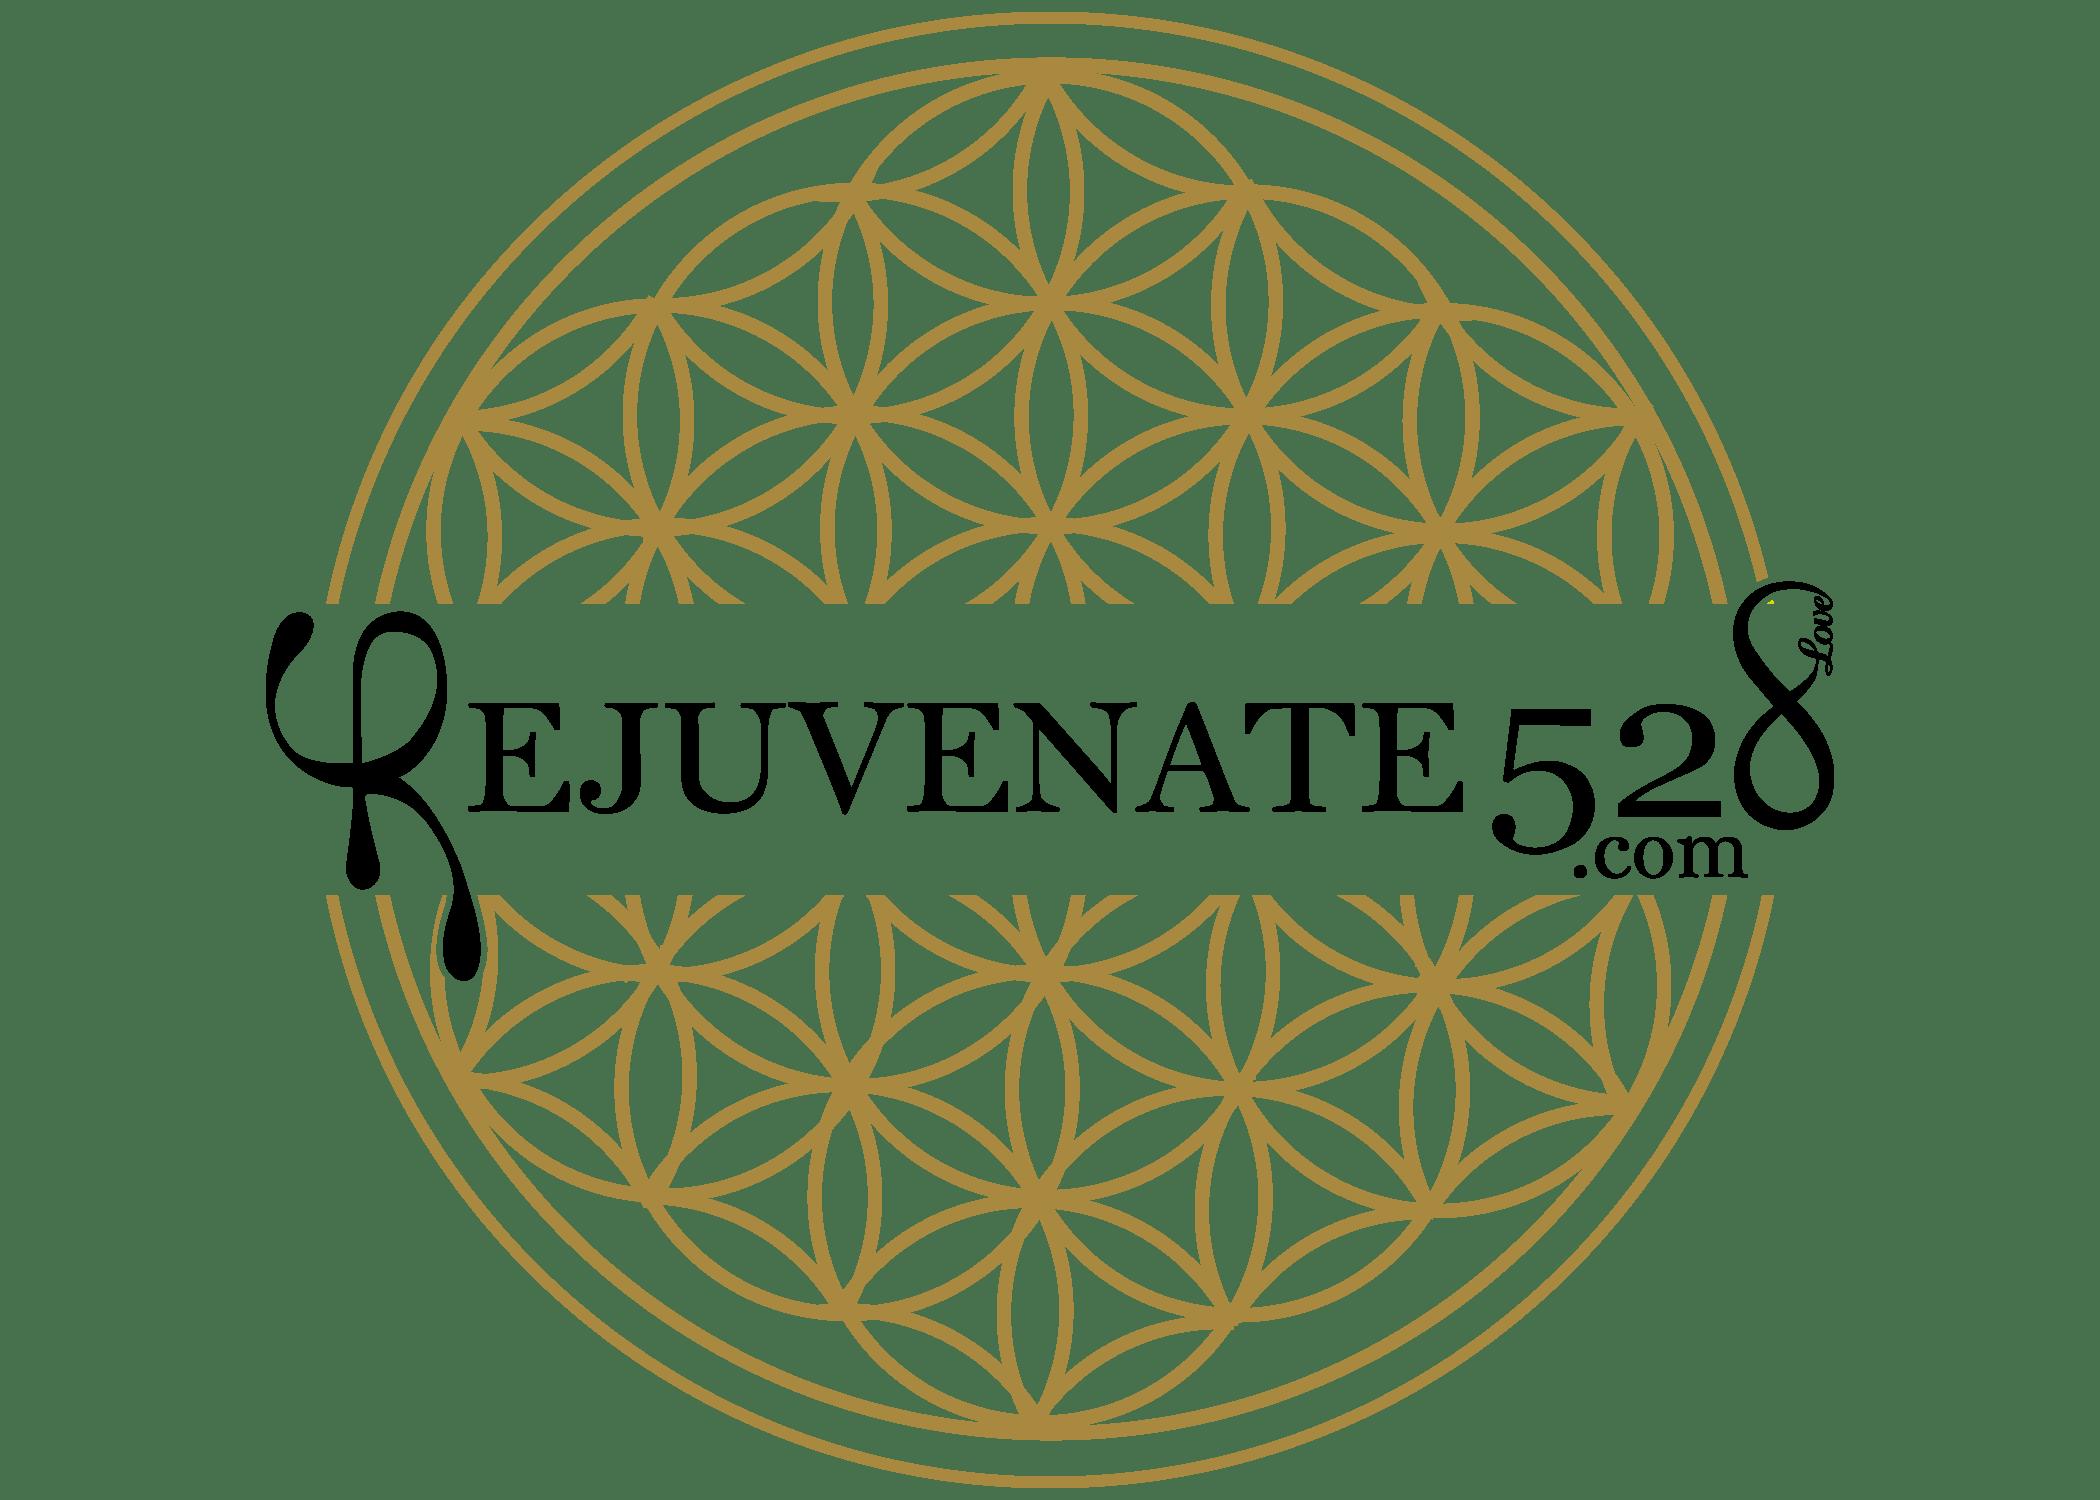 rejuvenate-528-medical-spa-sarasota-logo-black-lettering